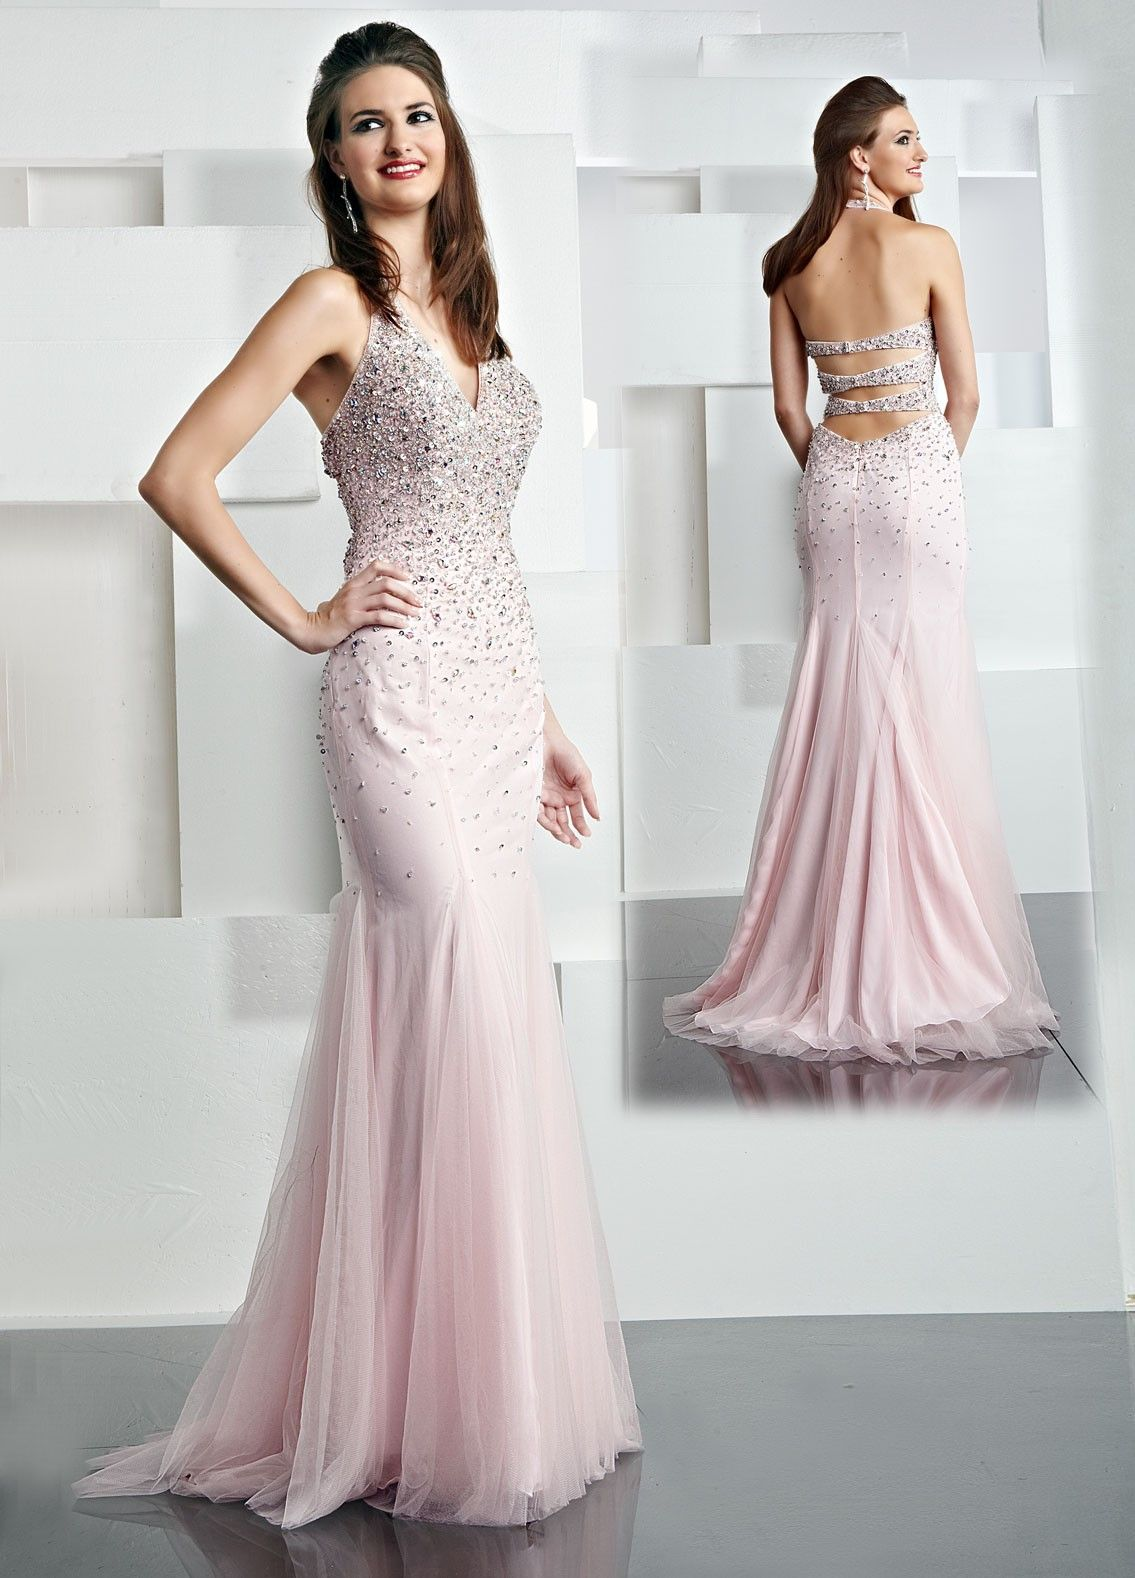 Latest fashion western girls long prom dresses collection long latest fashion western girls long prom dresses collection ombrellifo Images